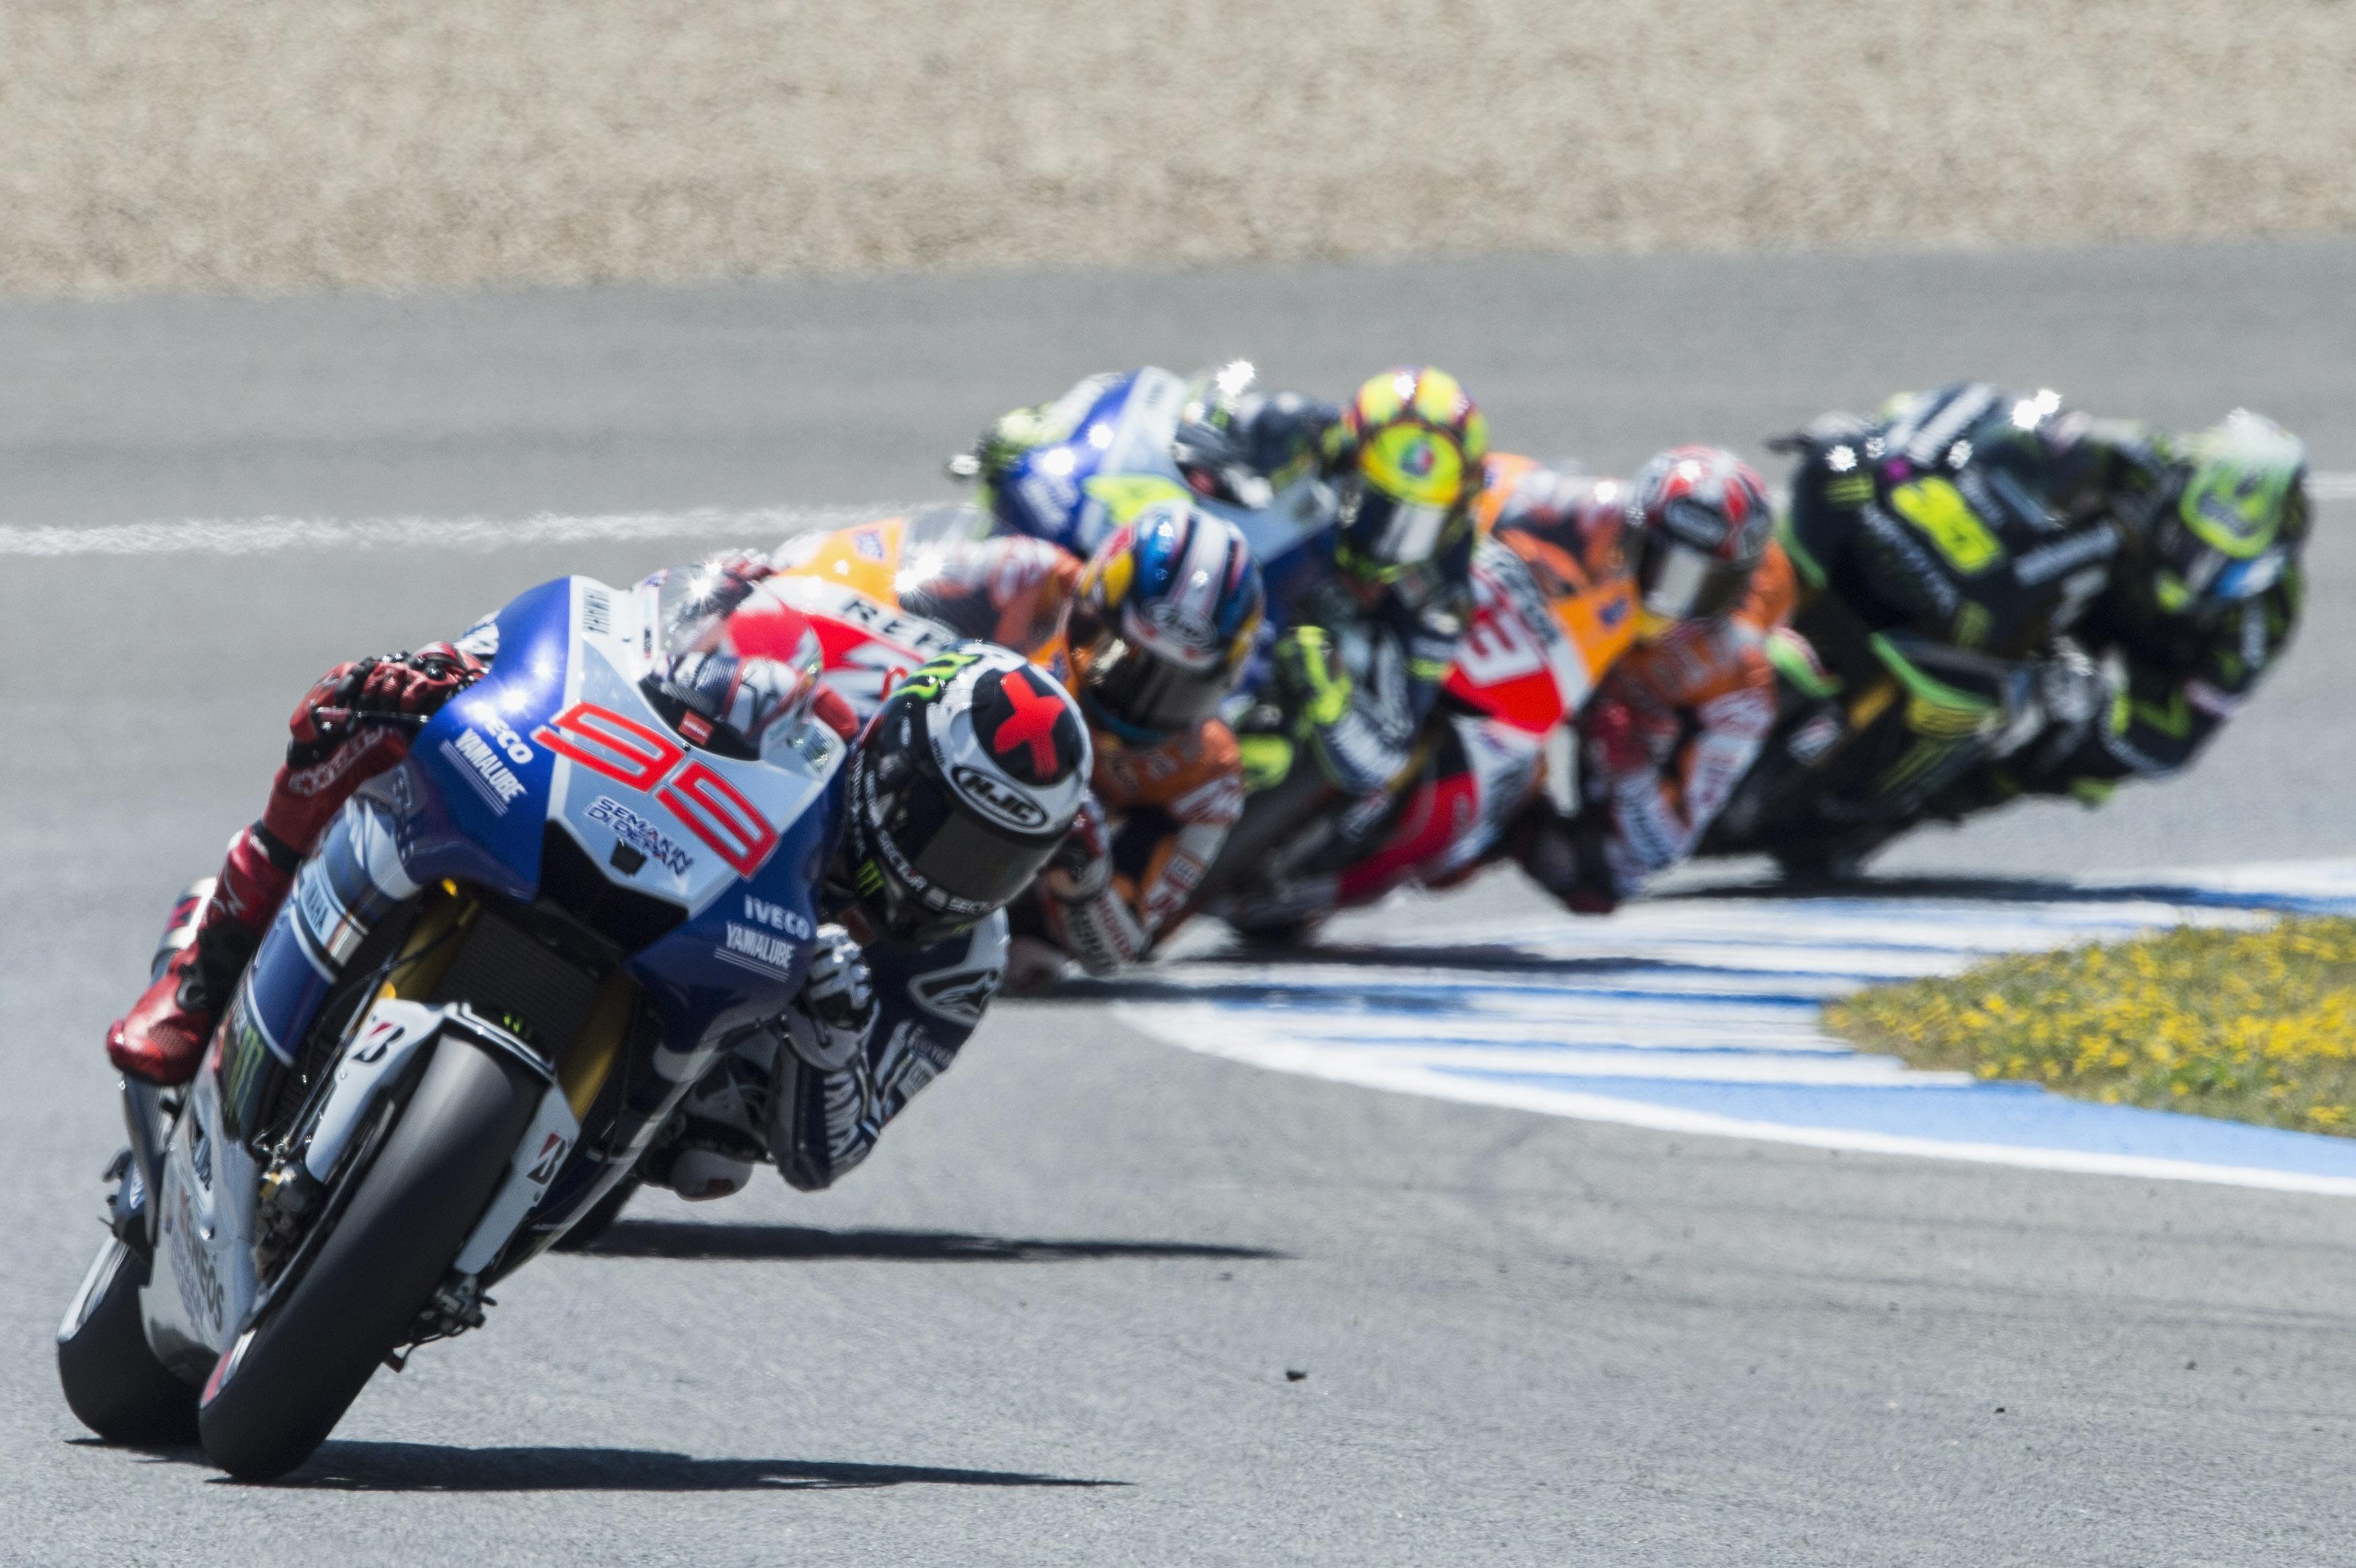 MotoGP TV price hike